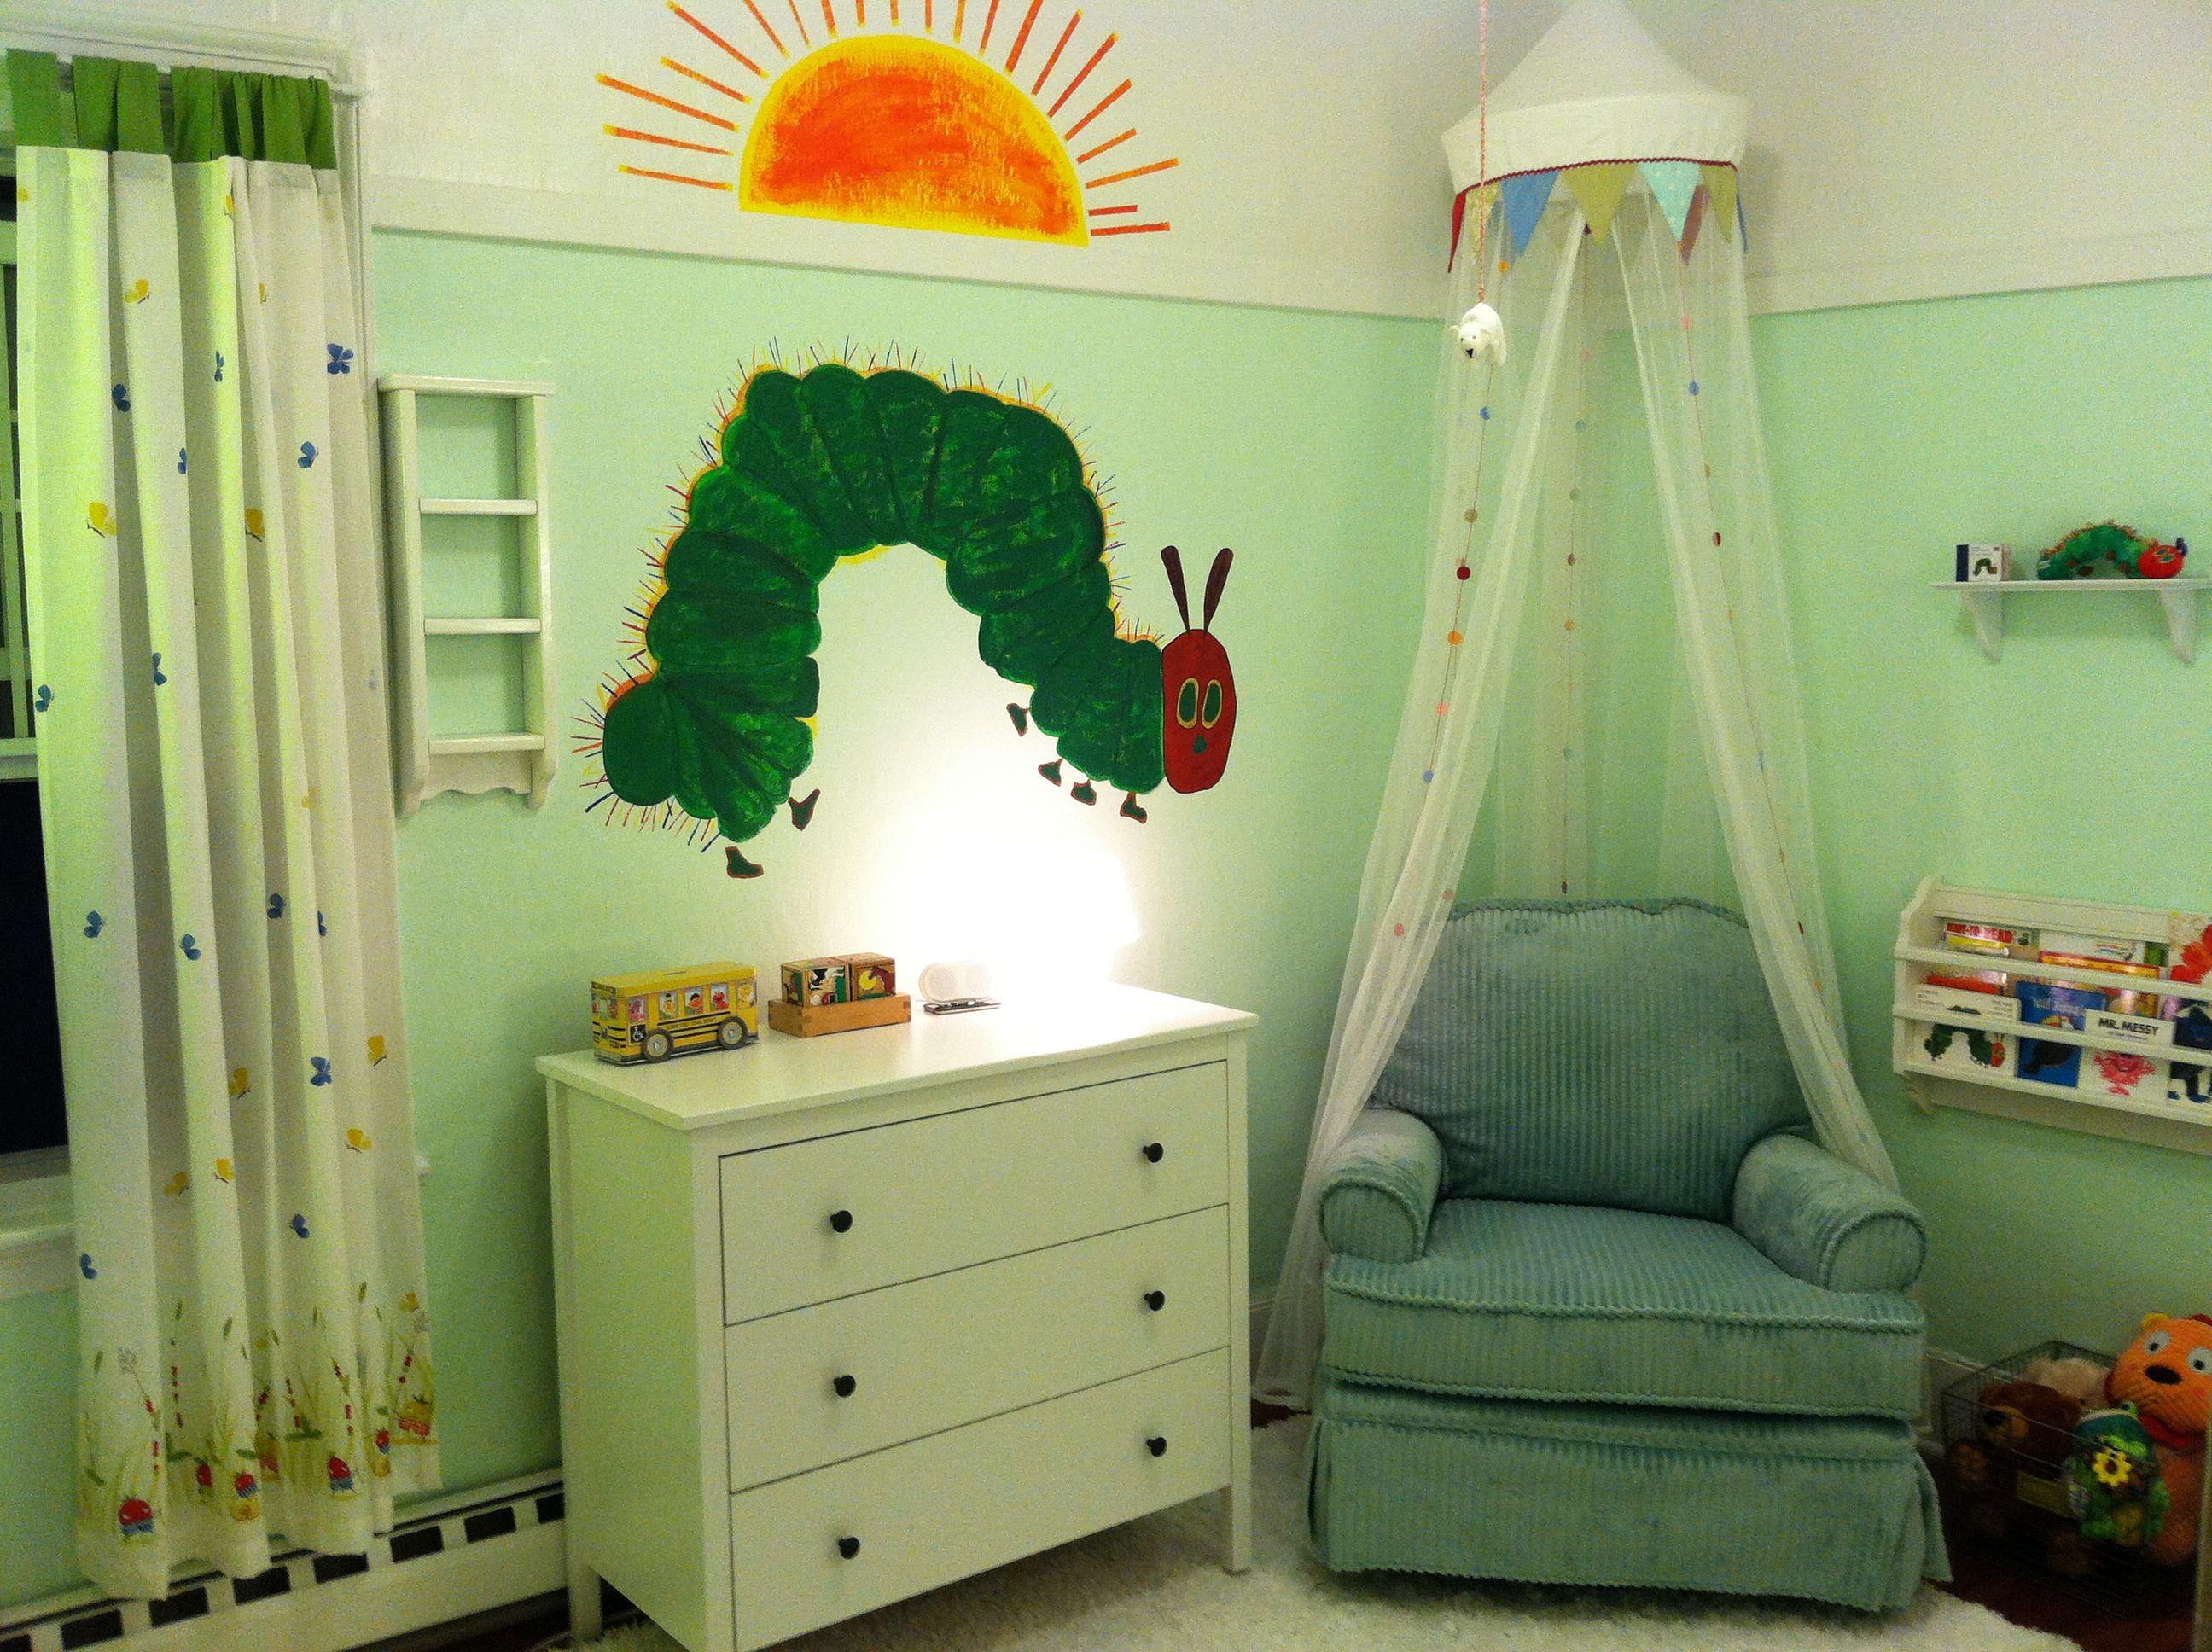 Fun Play Area For The Kids Playroom Storybook Nursery